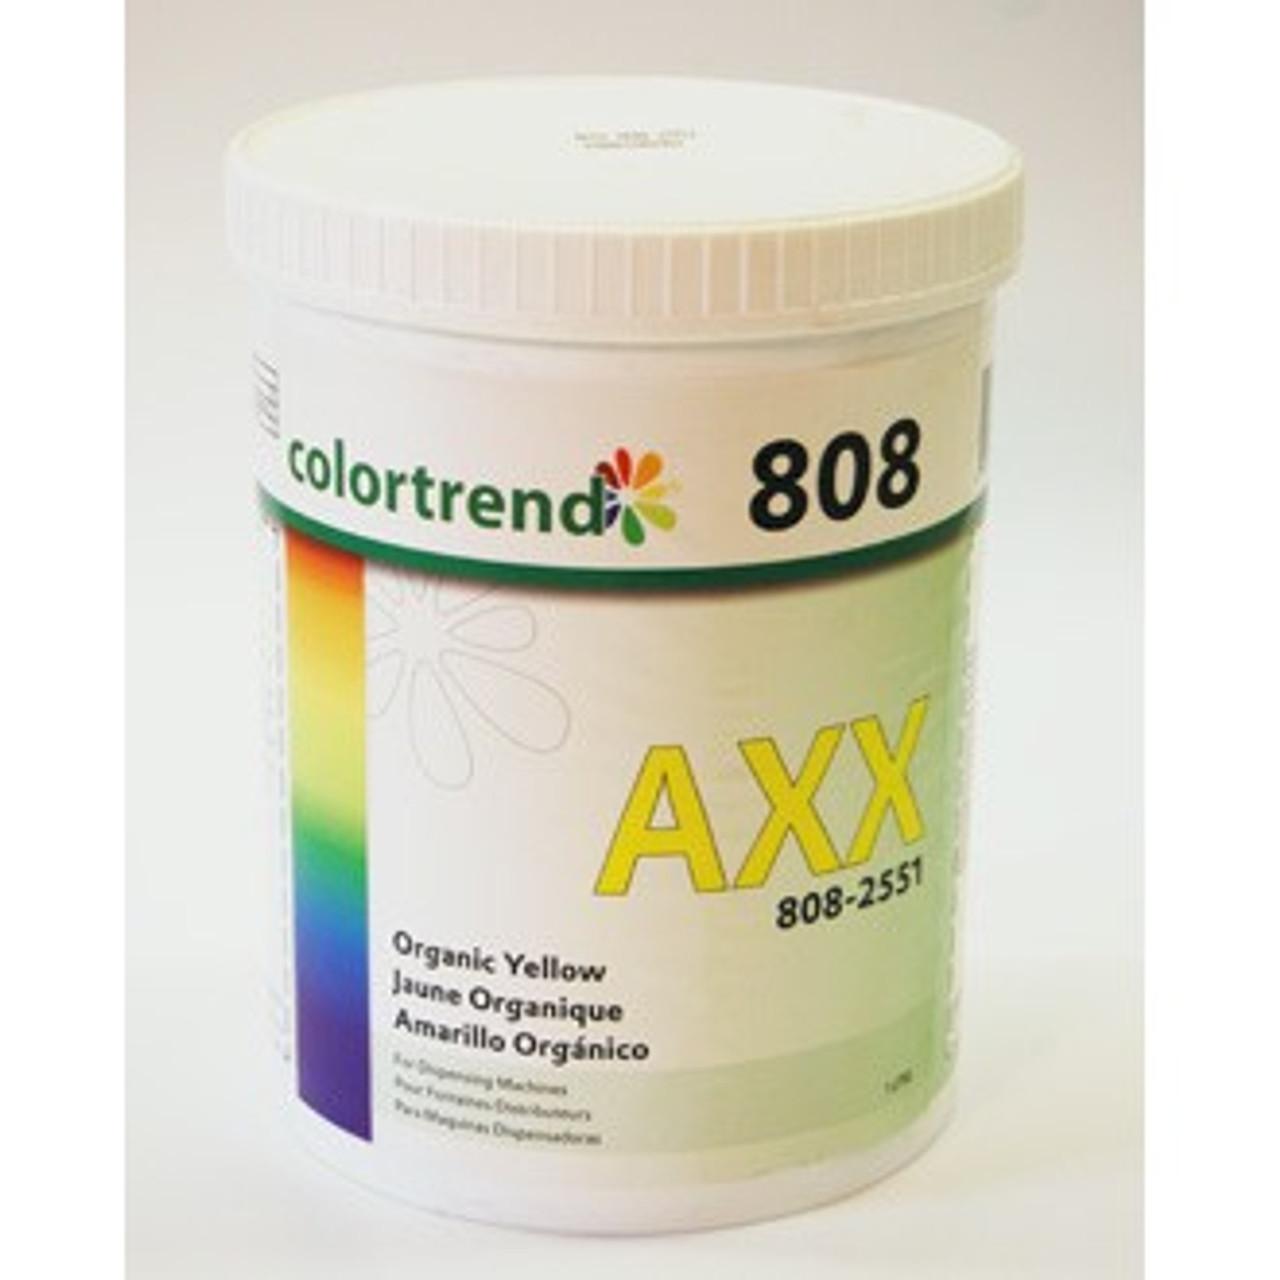 Chromaflo Colortrend Universal Colorant 808-2009 Raw Umber - L - Quart